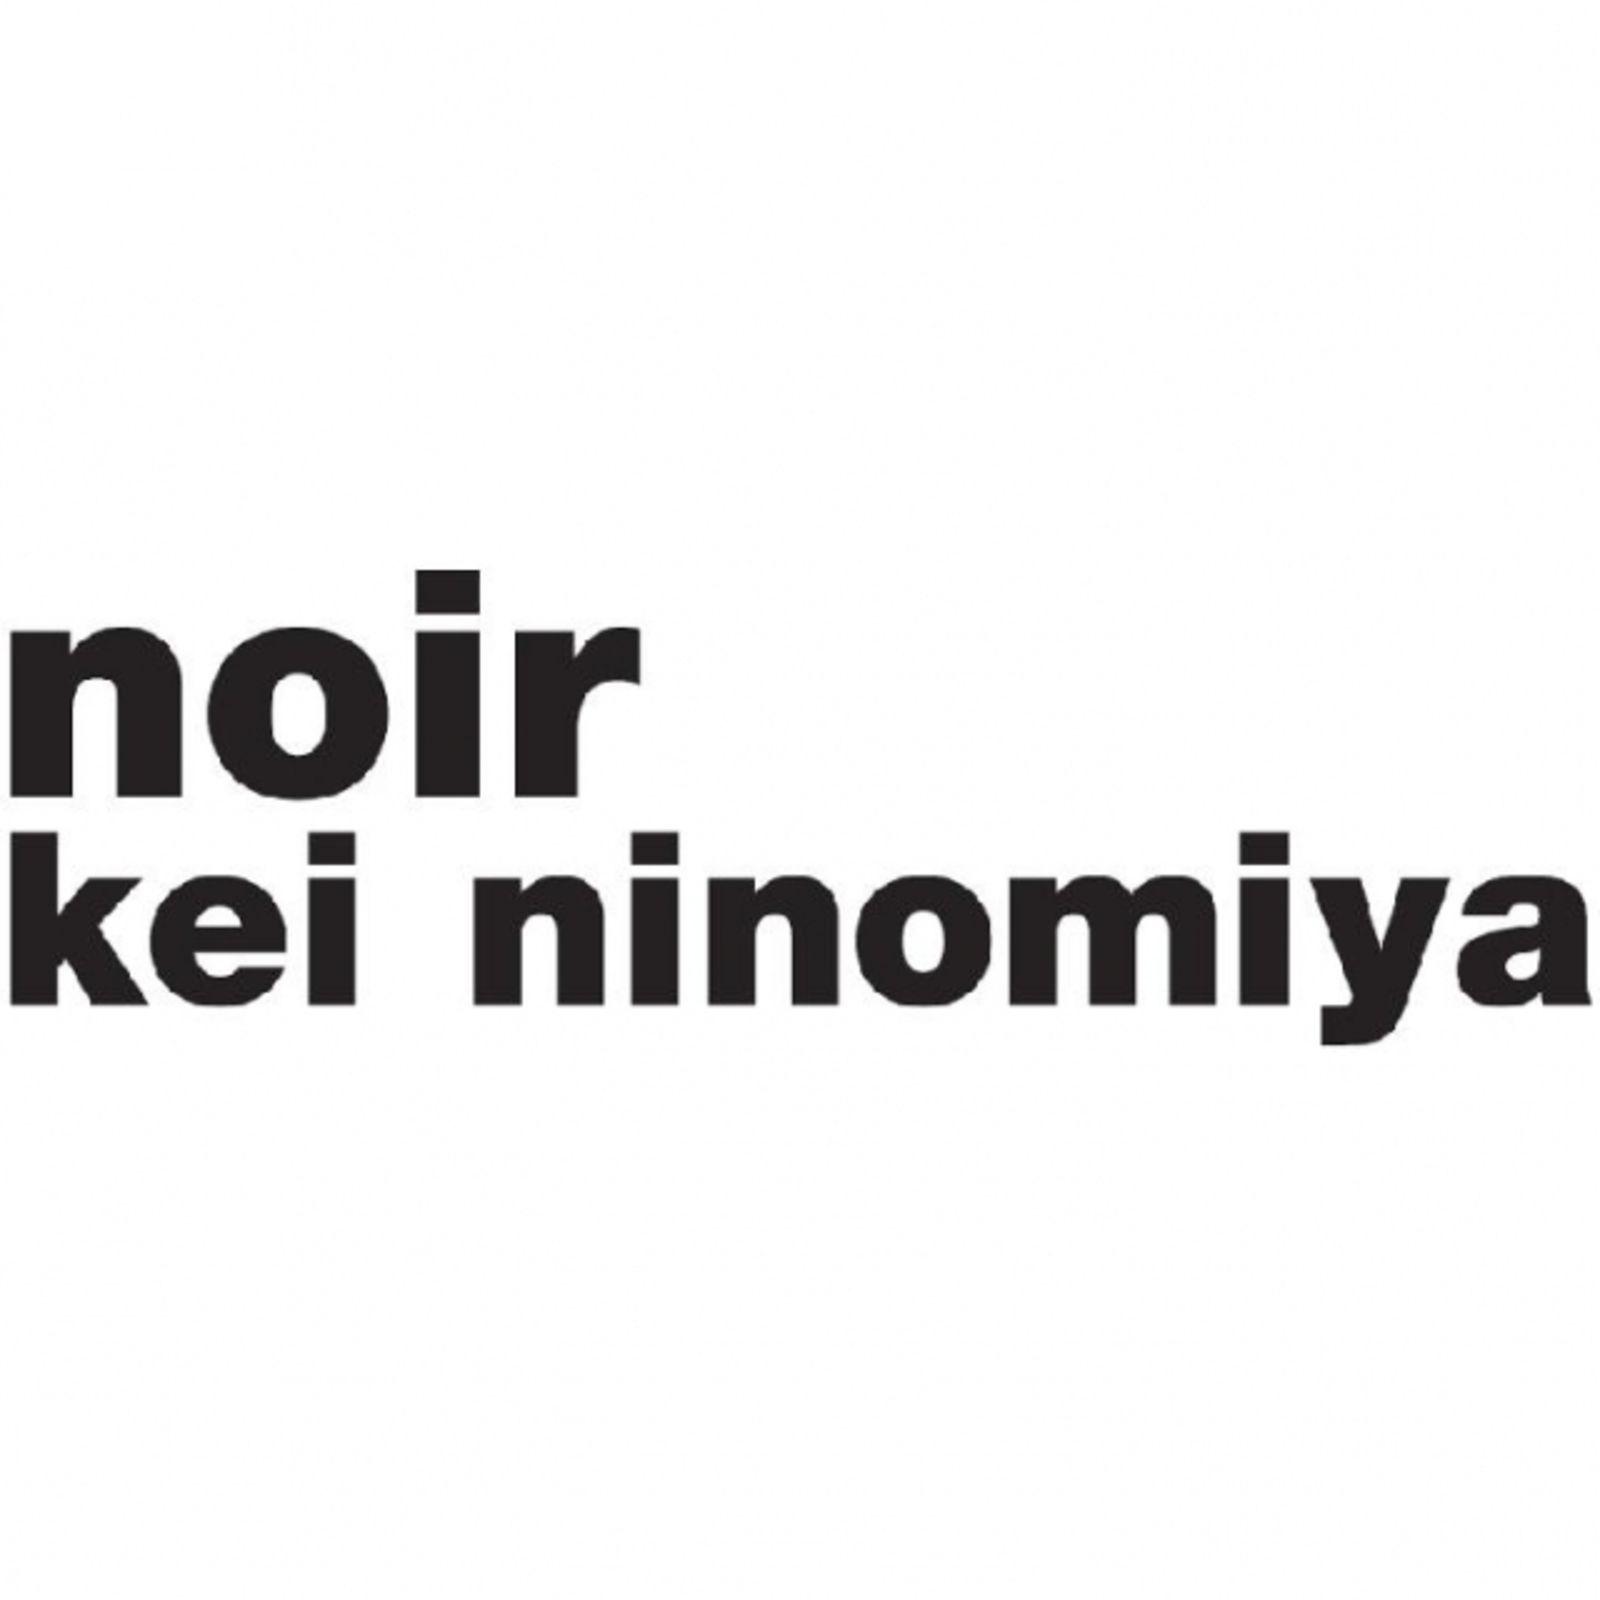 noir kei ninomiya (Bild 1)